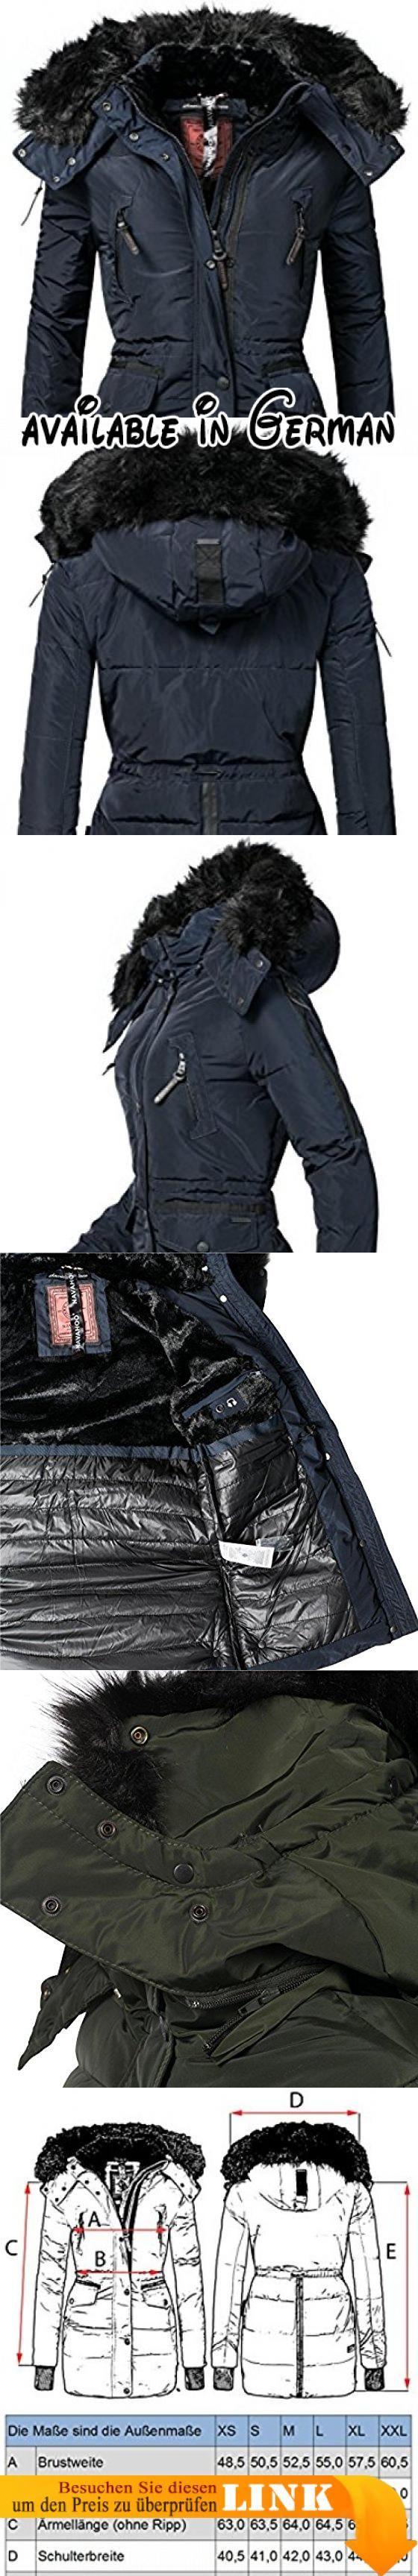 Navahoo Damen Jacke Wintermantel Winterparka Sesa (vegan hergestellt) Navy  Gr. M. Ausgefallener bcca772cee